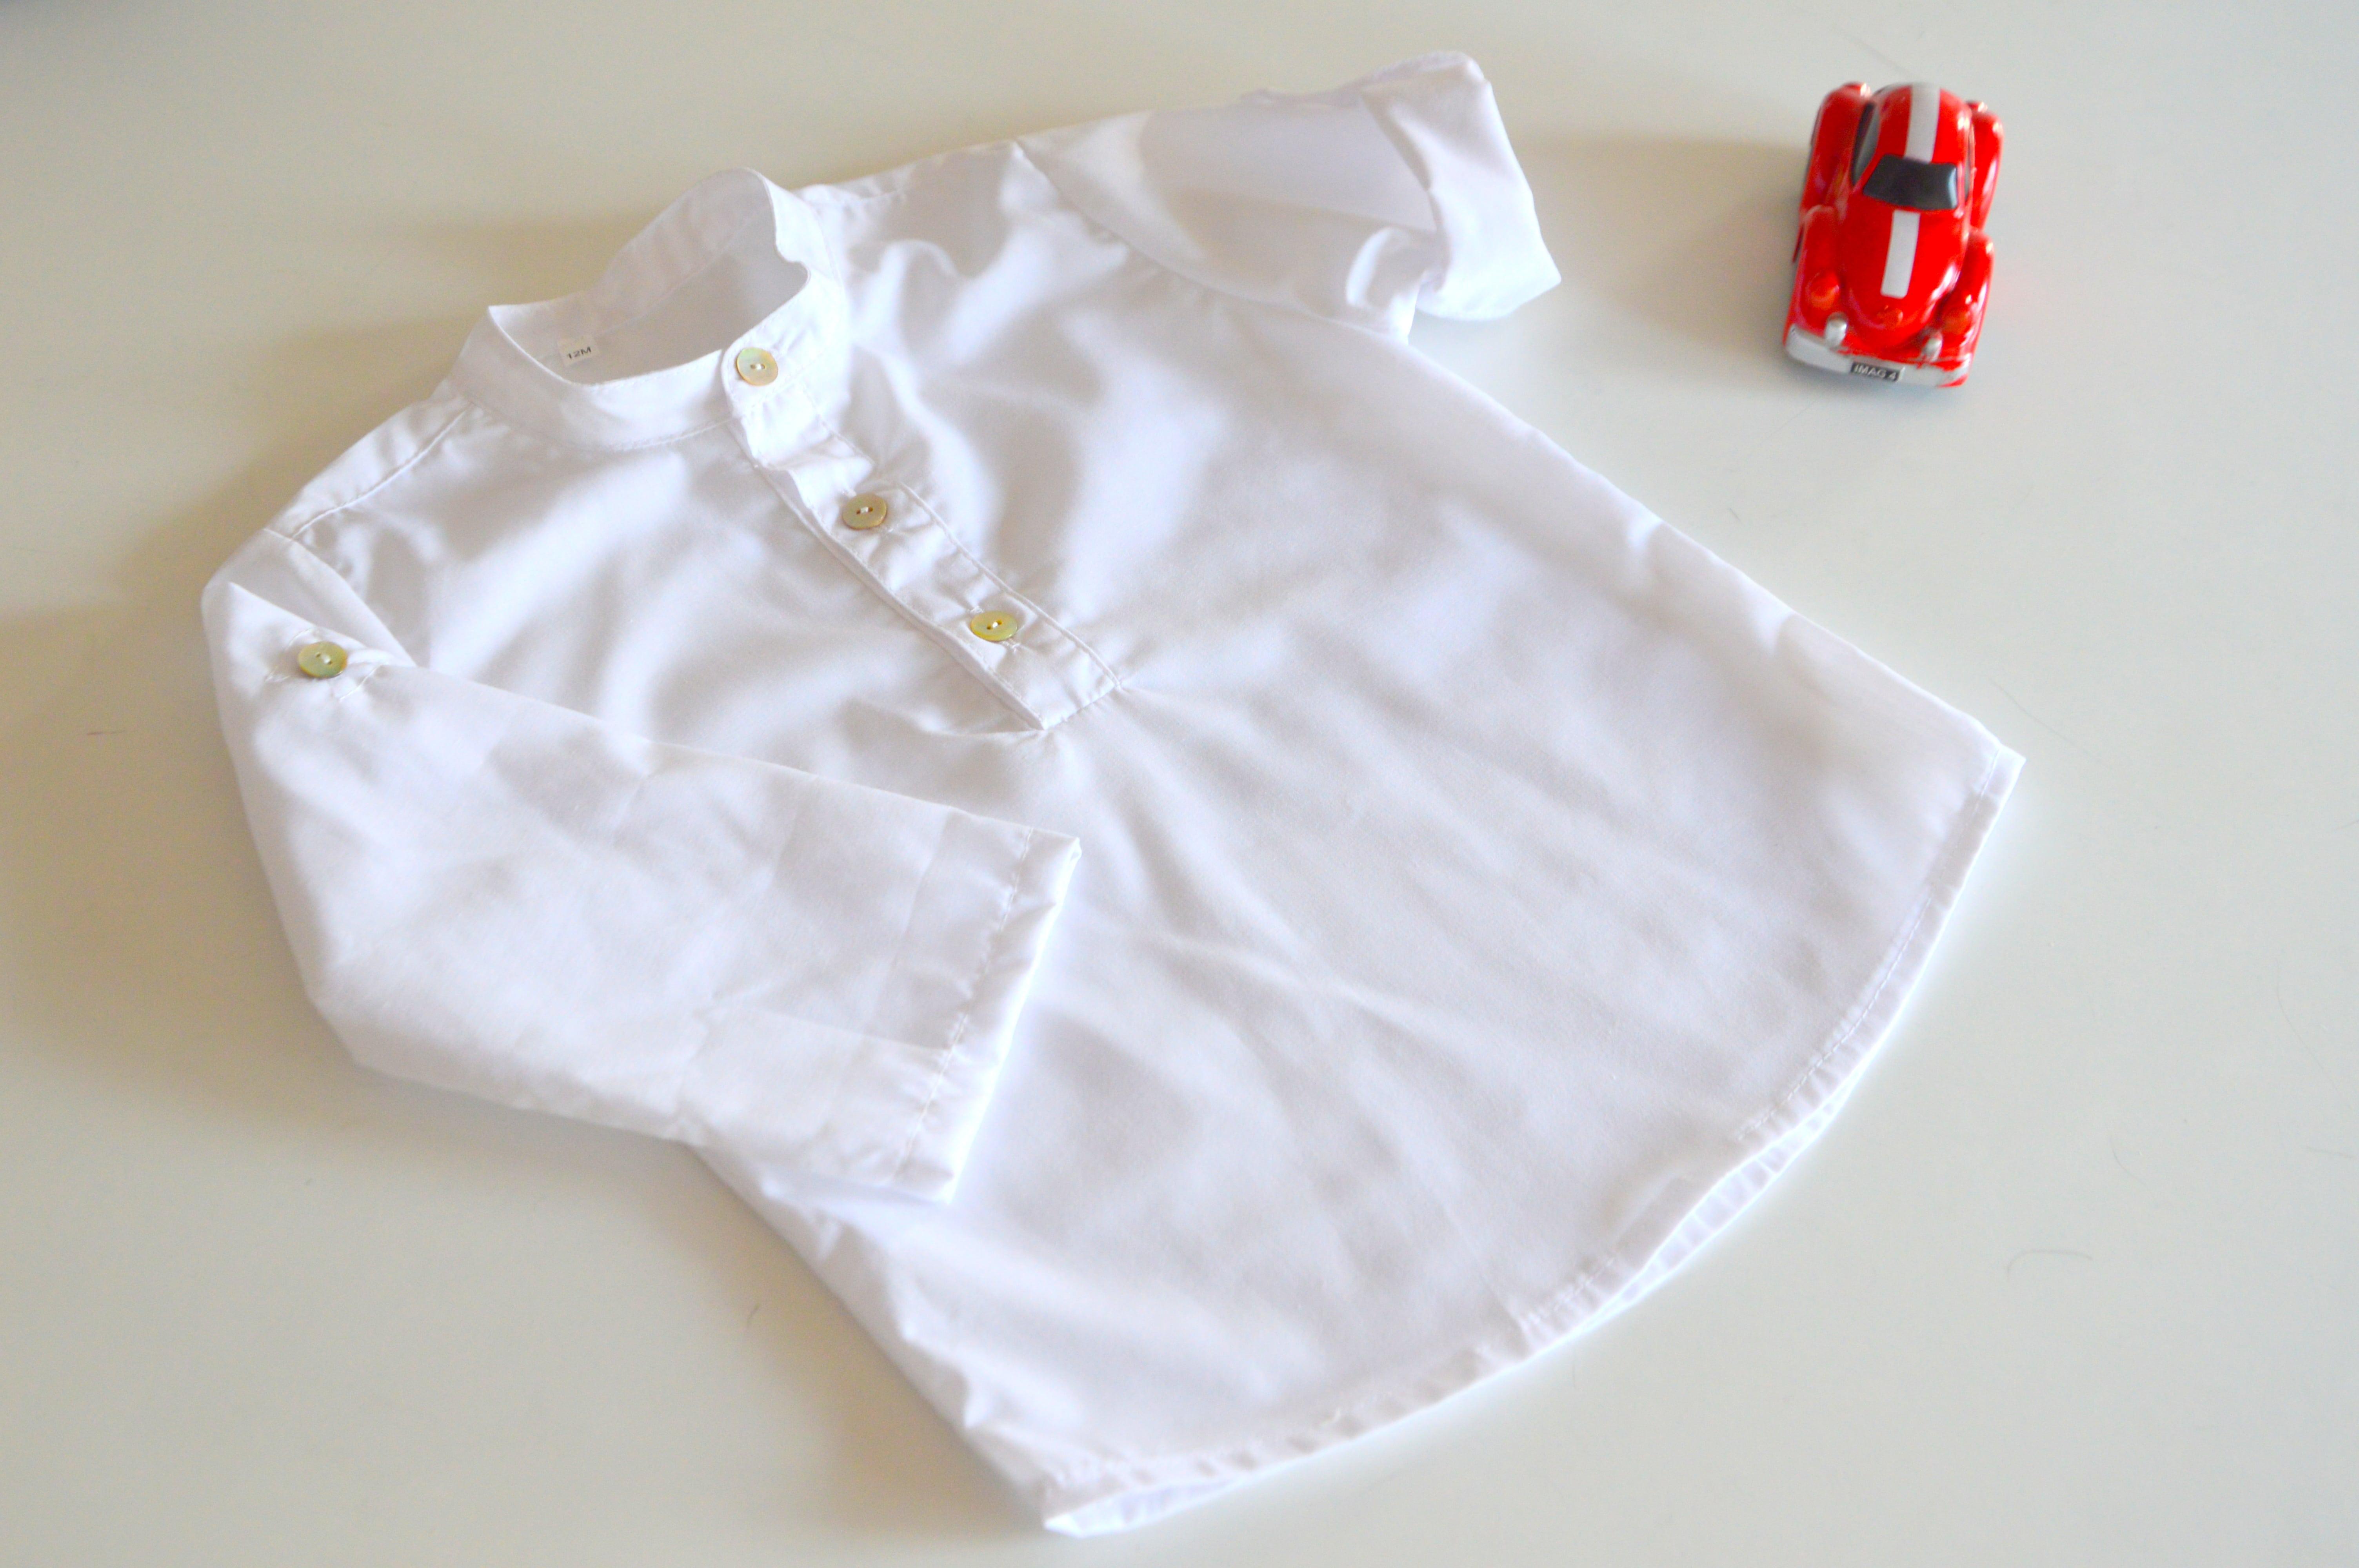 Camisa branca (White shirt)